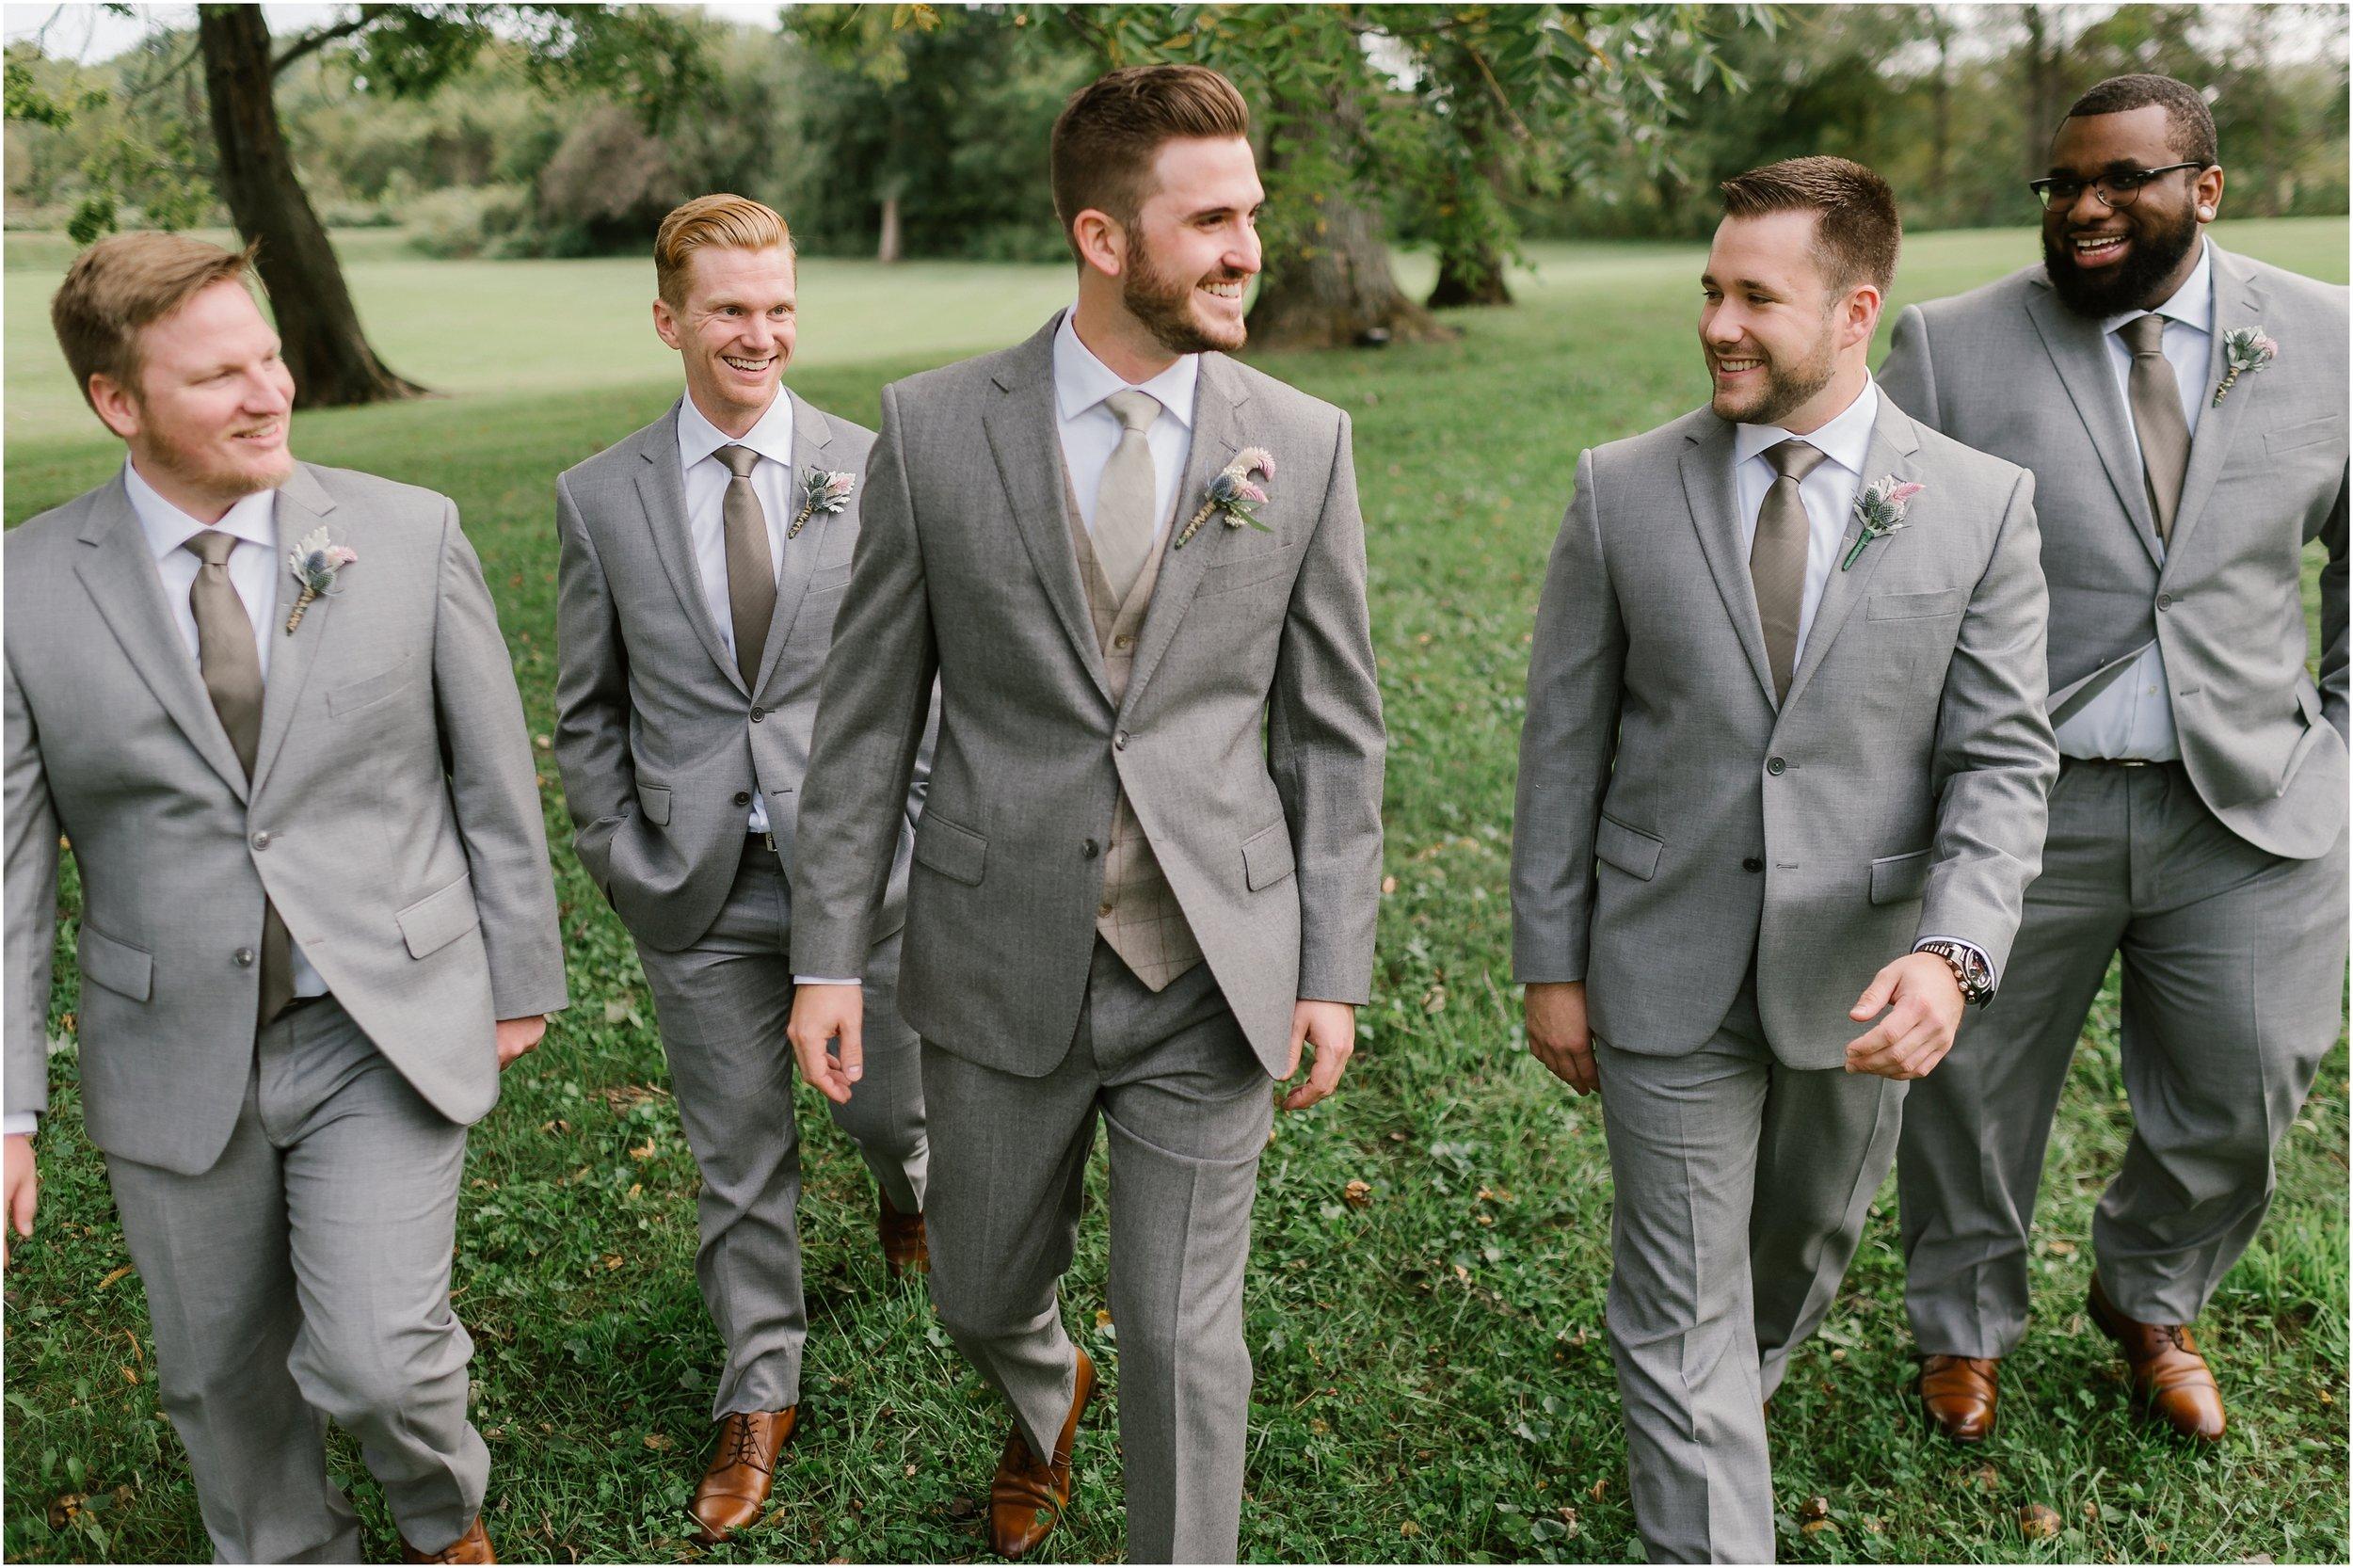 Rebecca_Shehorn_Photography_Indianapolis_Wedding_Photographer_9261.jpg